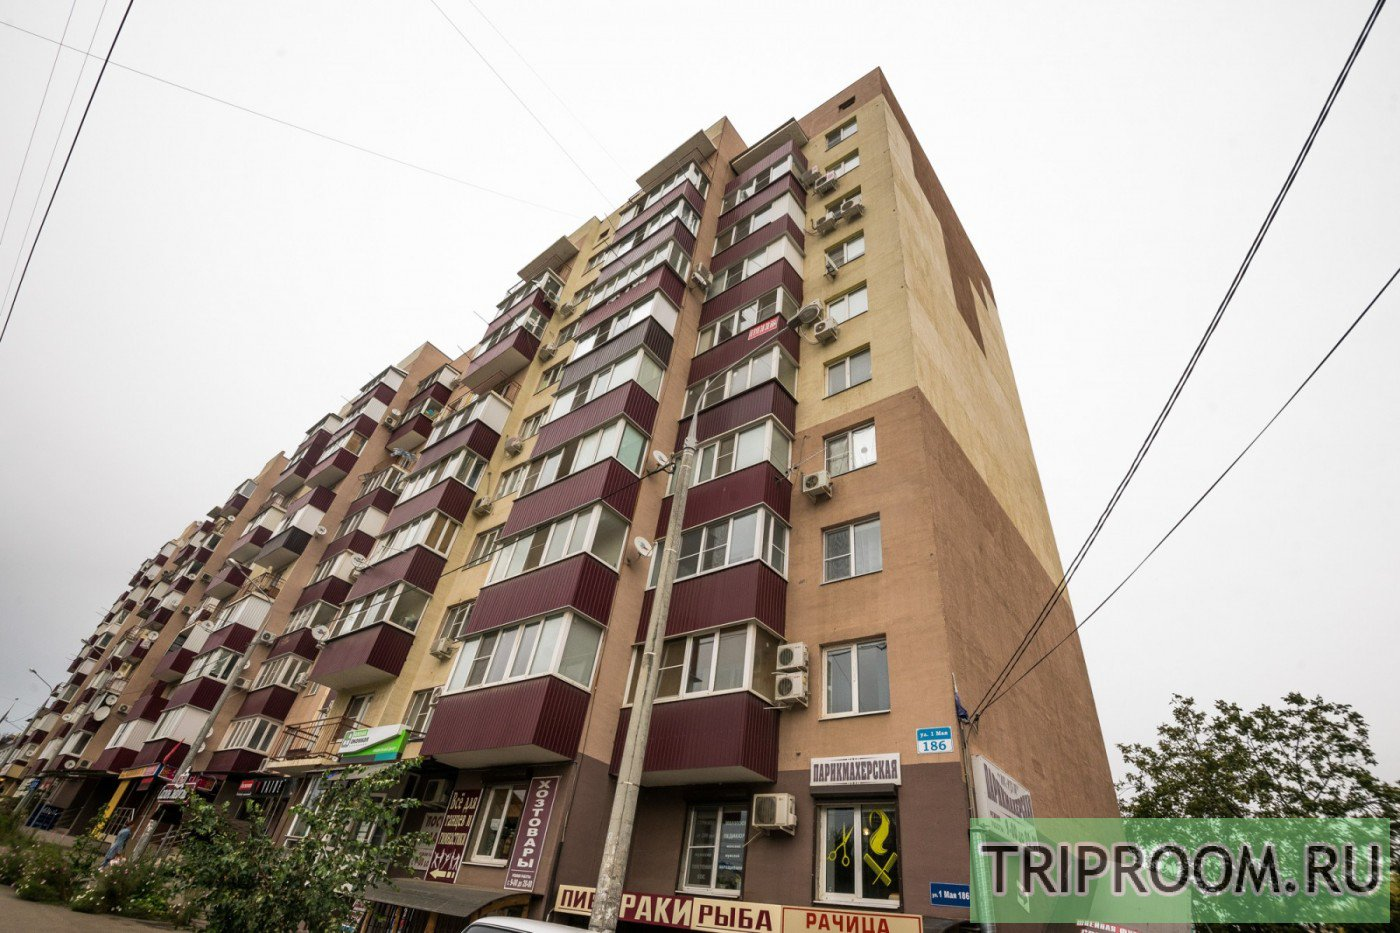 1-комнатная квартира посуточно (вариант № 36596), ул. 1-го Мая улица, фото № 4